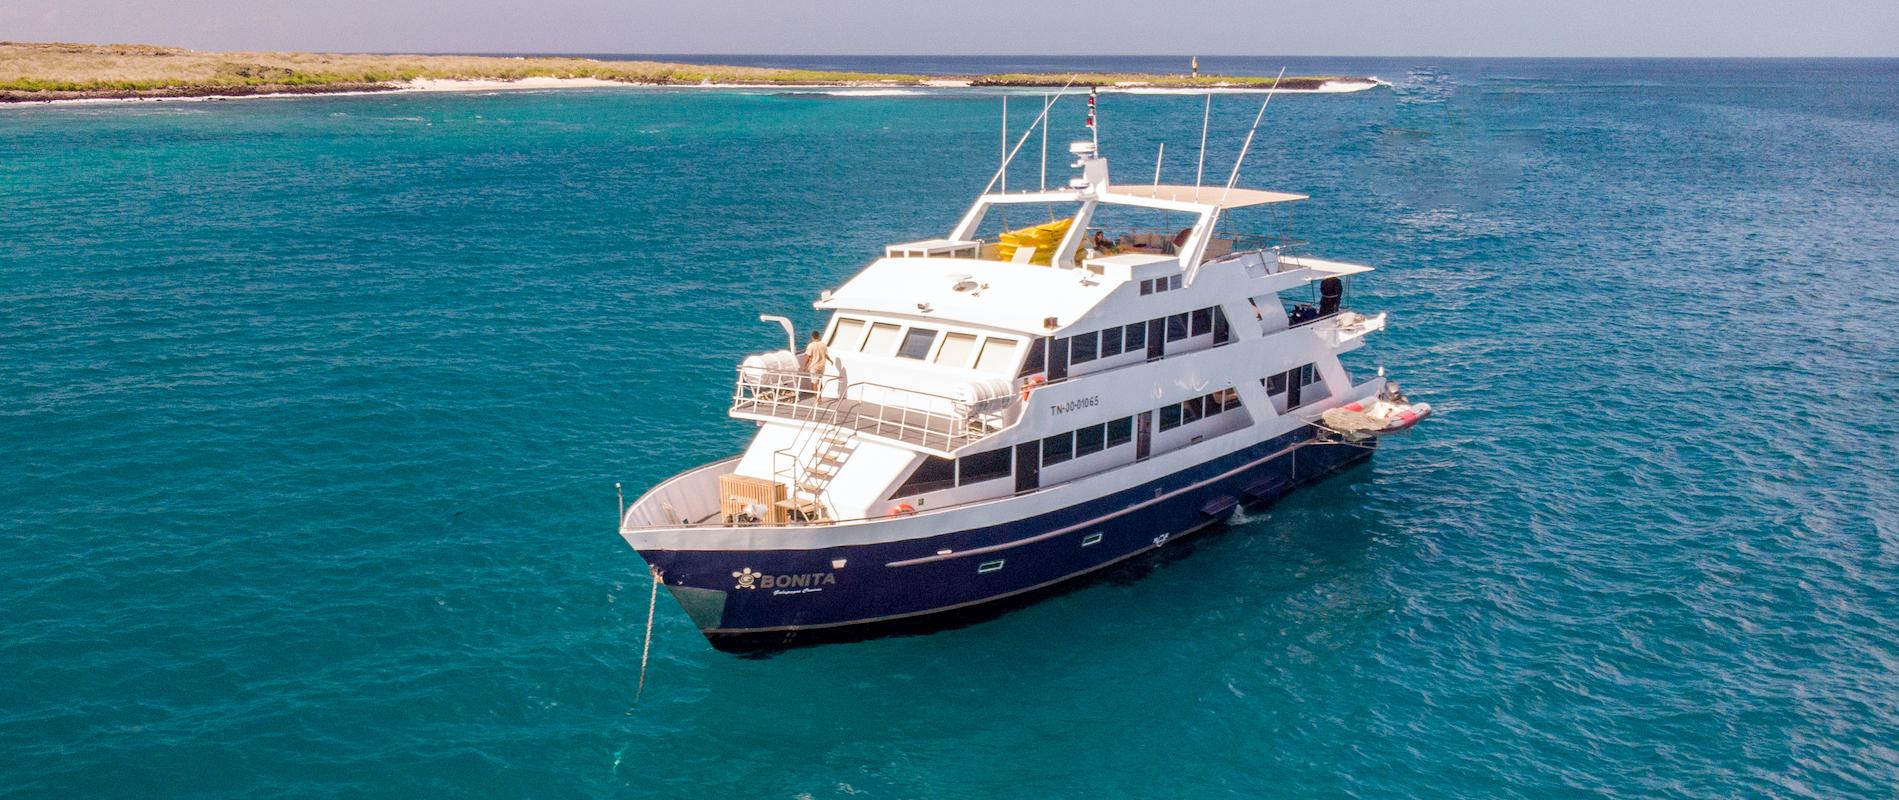 M/Y Bonita Galapagos Yacht